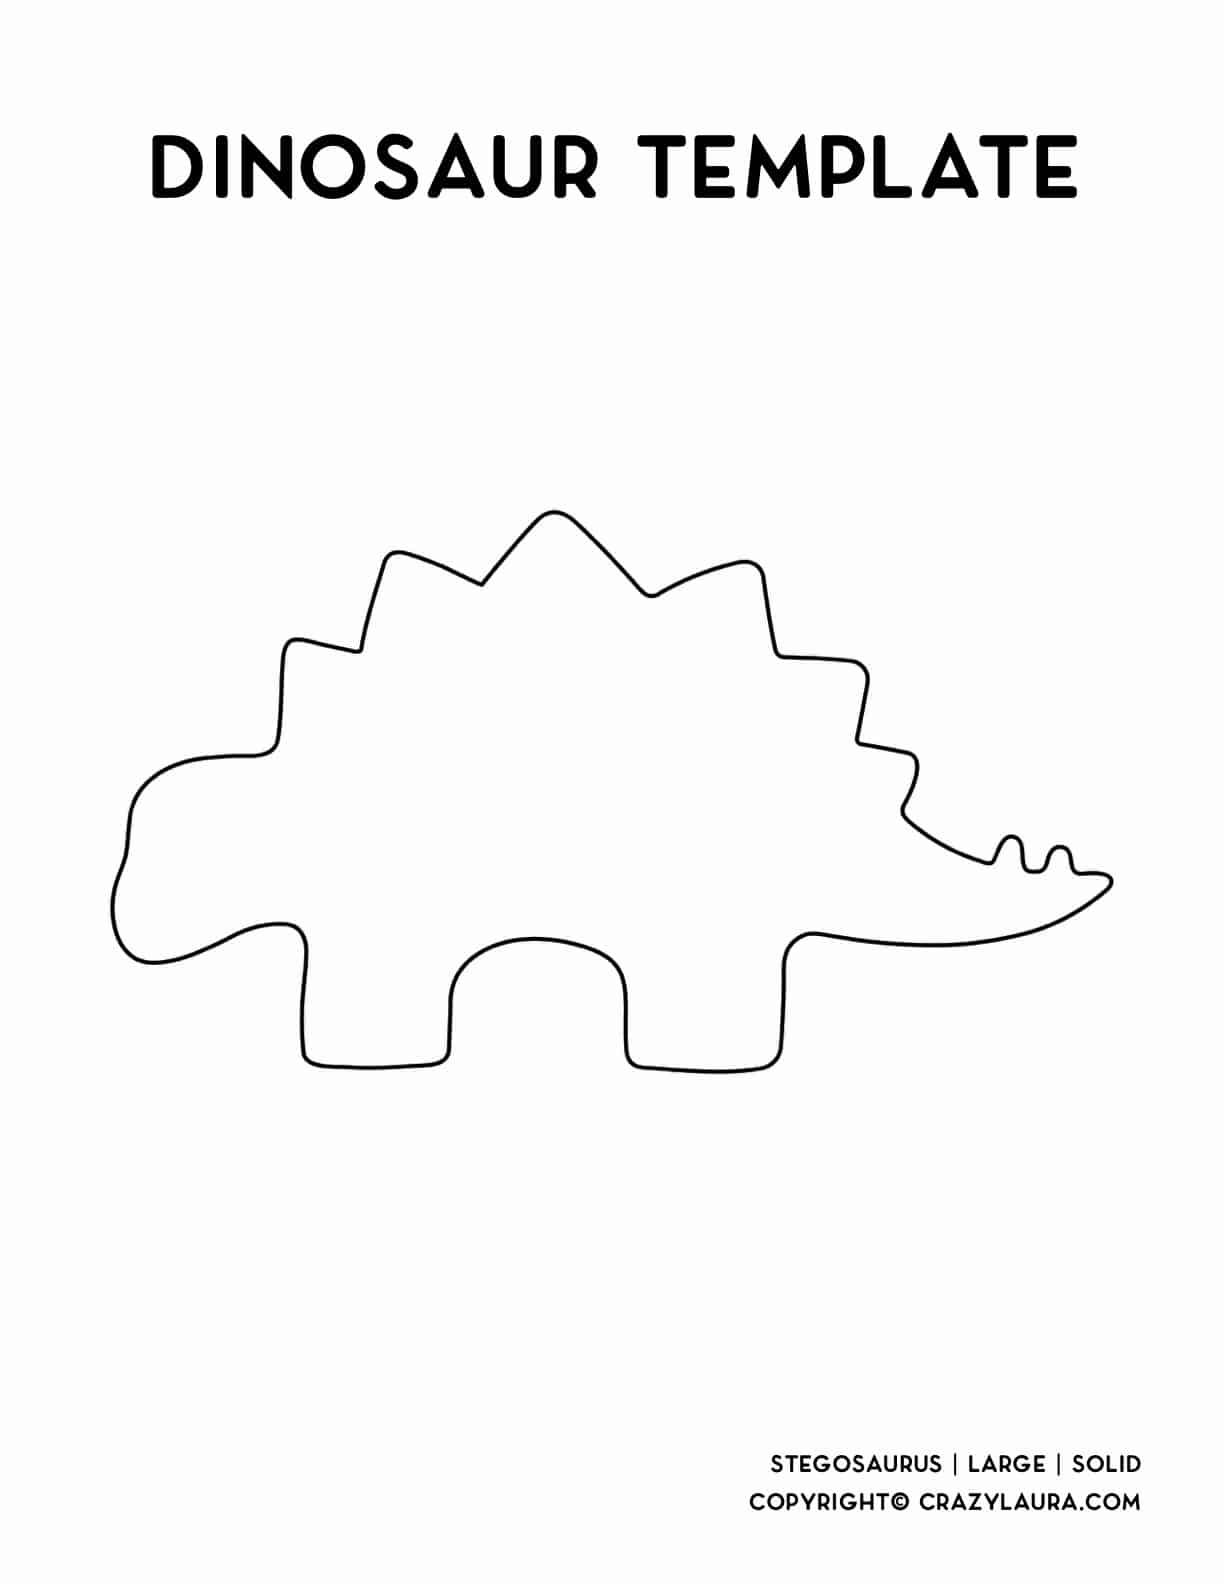 solid outline of stegosaurus dinosaur